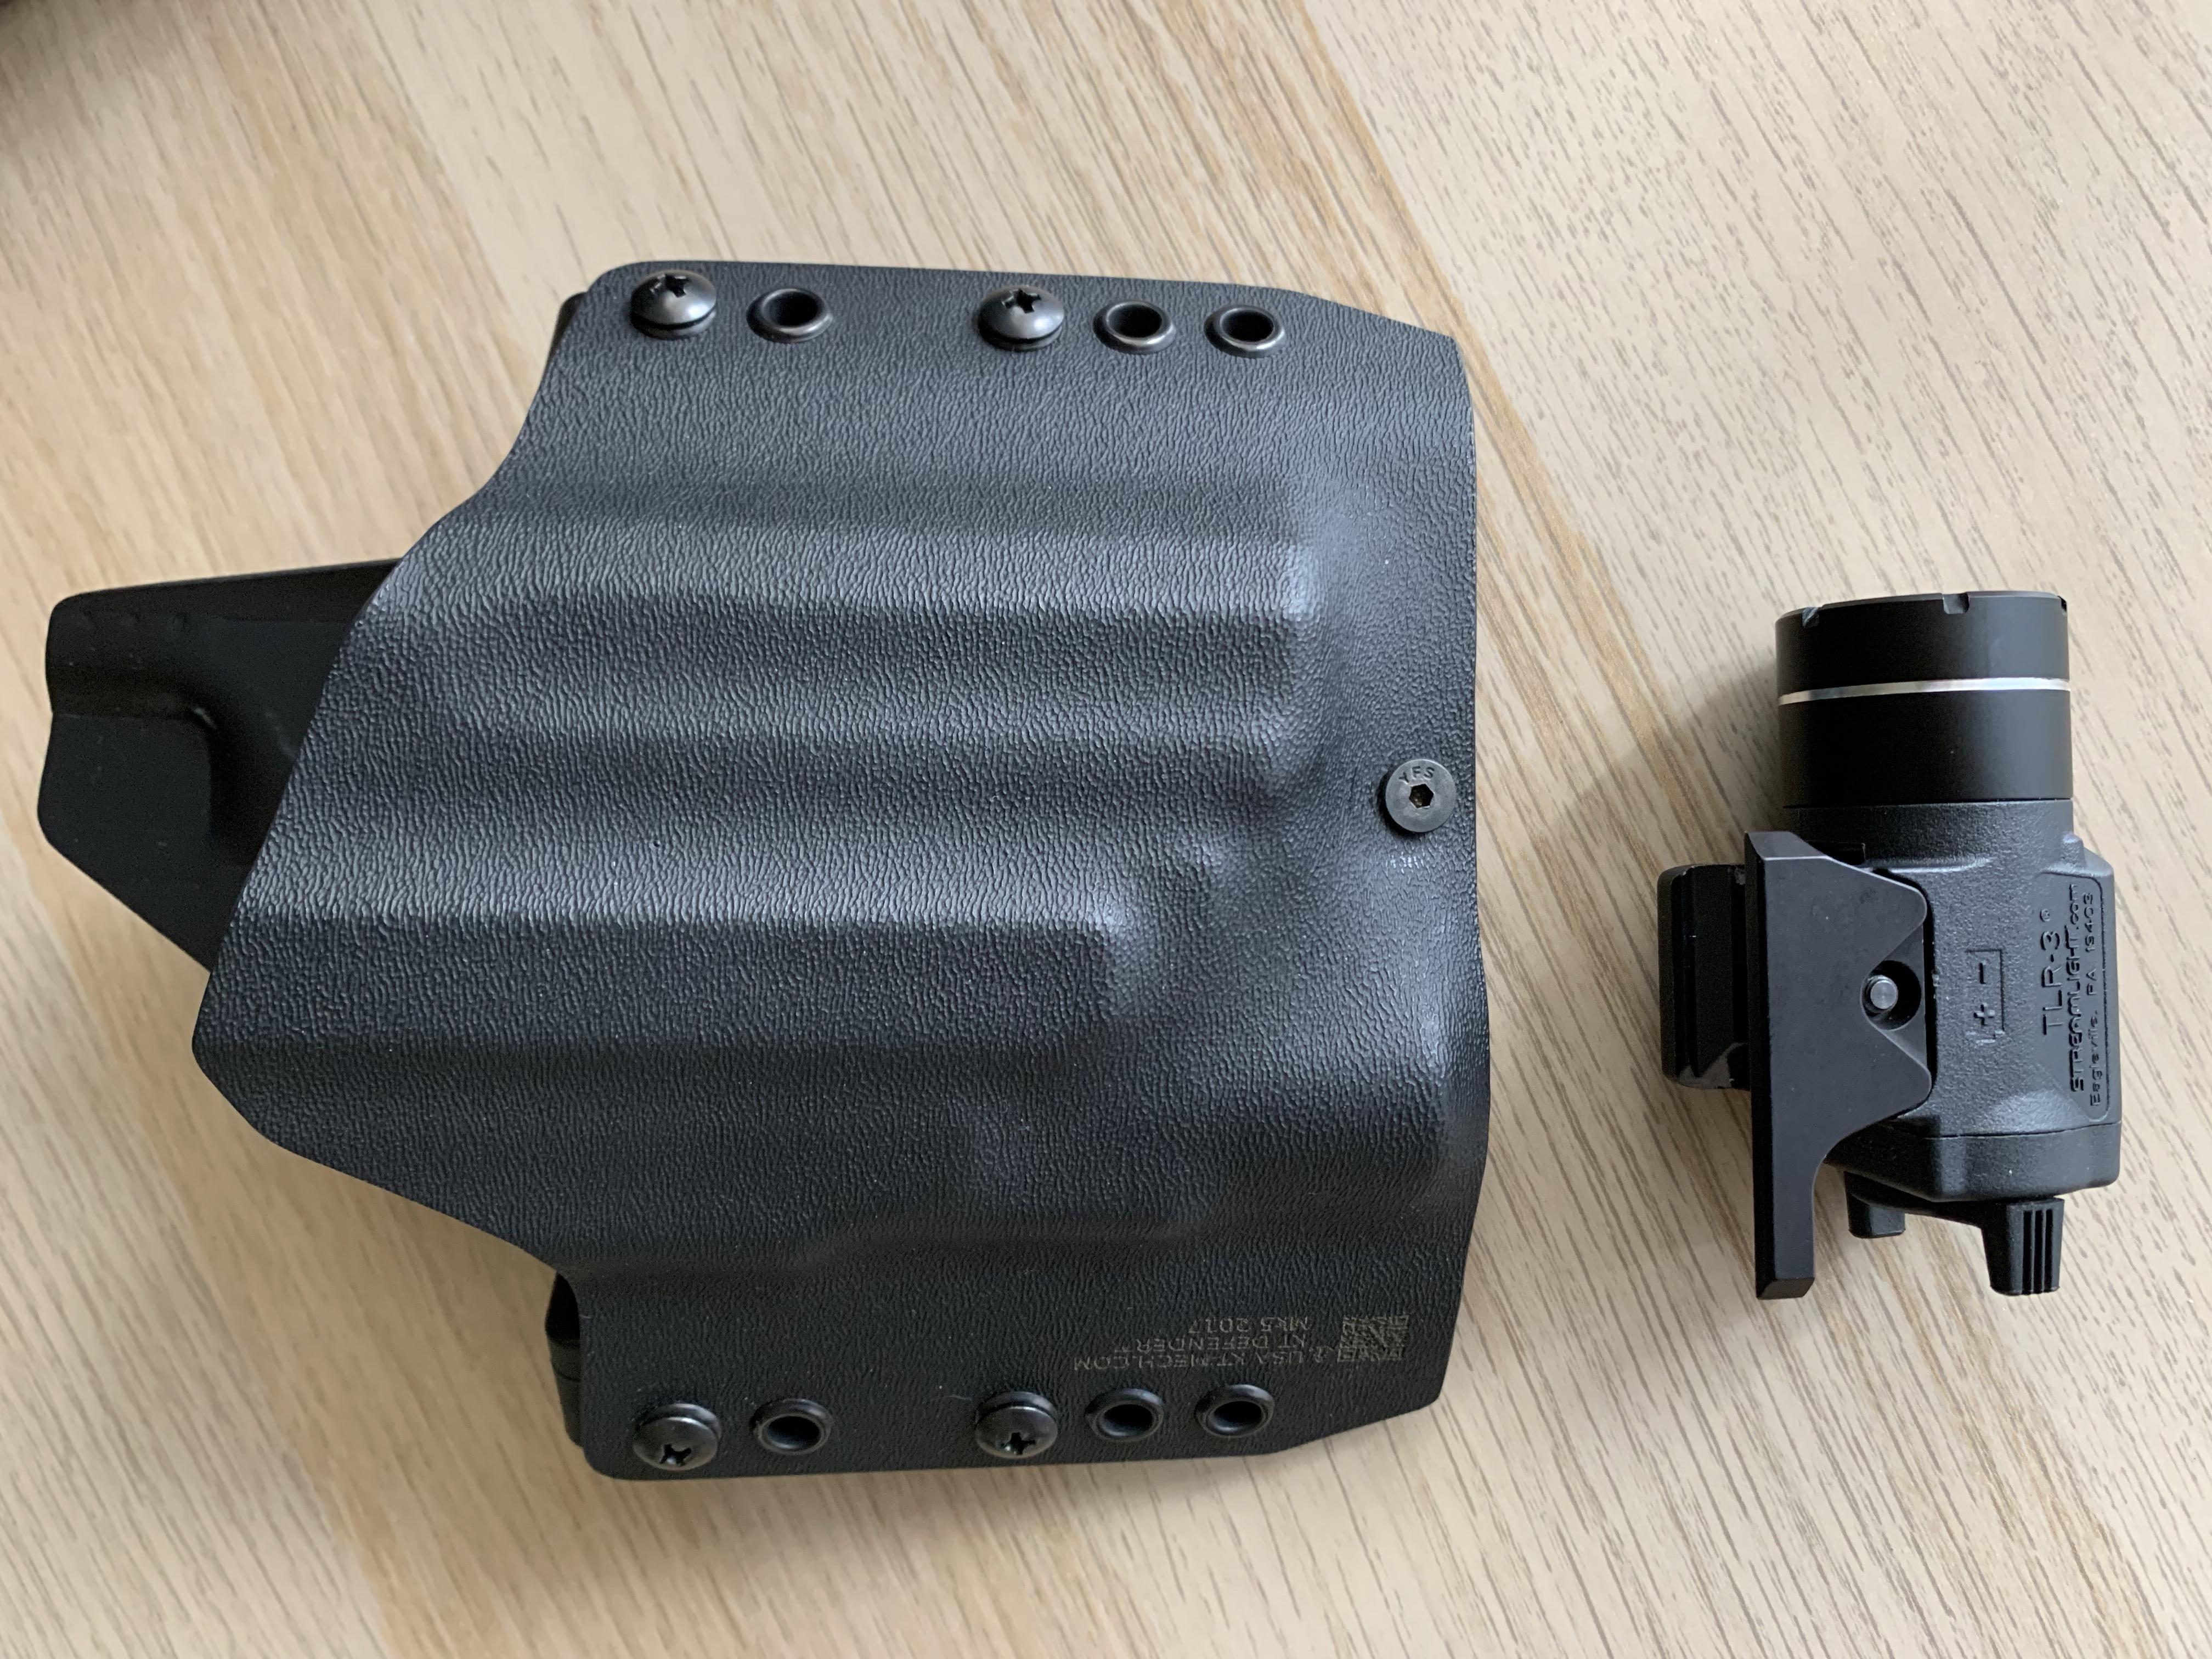 WTS - SOLD - USP Compact 9/40 Kydex Light Bearing Holster w/TLR-3 Streamlight-n-1g2jgvrqswnumabwla6a.jpg